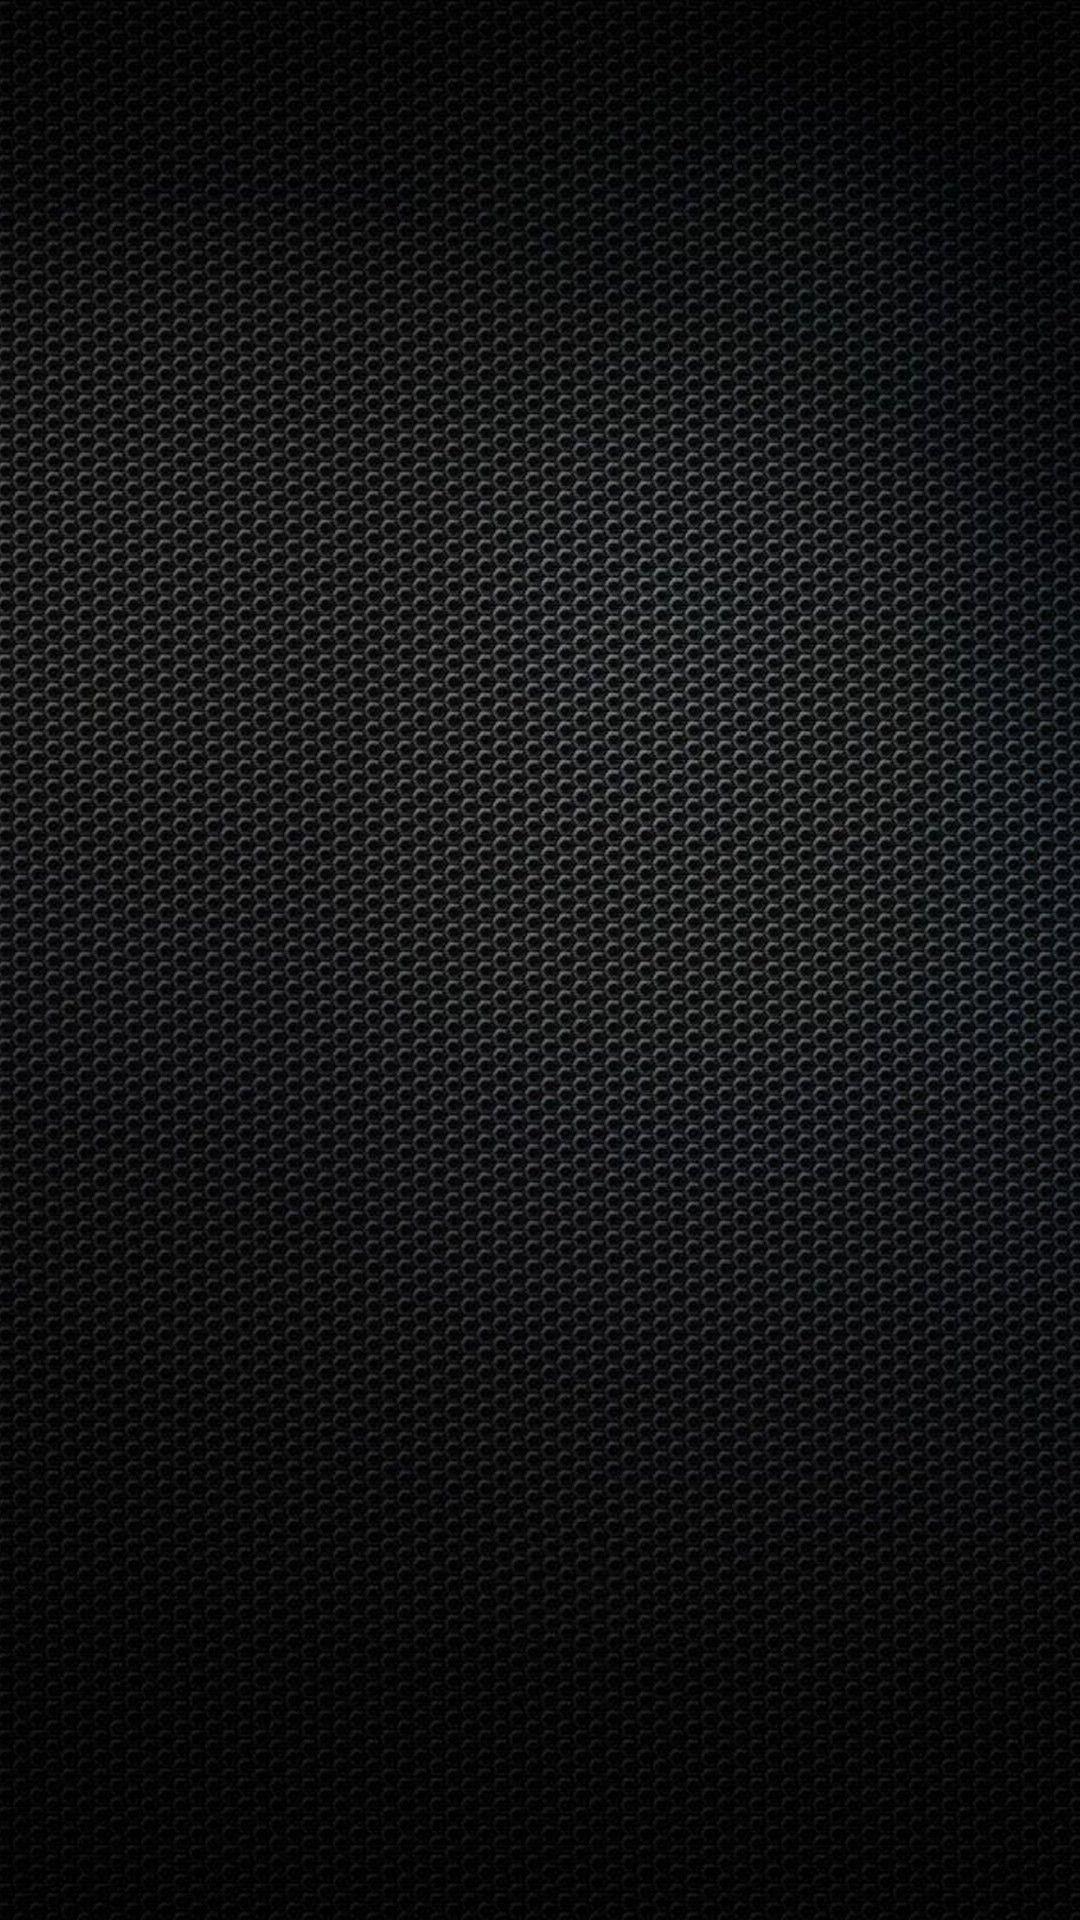 iPhone 6 Plus Wallpaper Dark Pattern 02 iPhone 6 Wallpapers 1080x1920